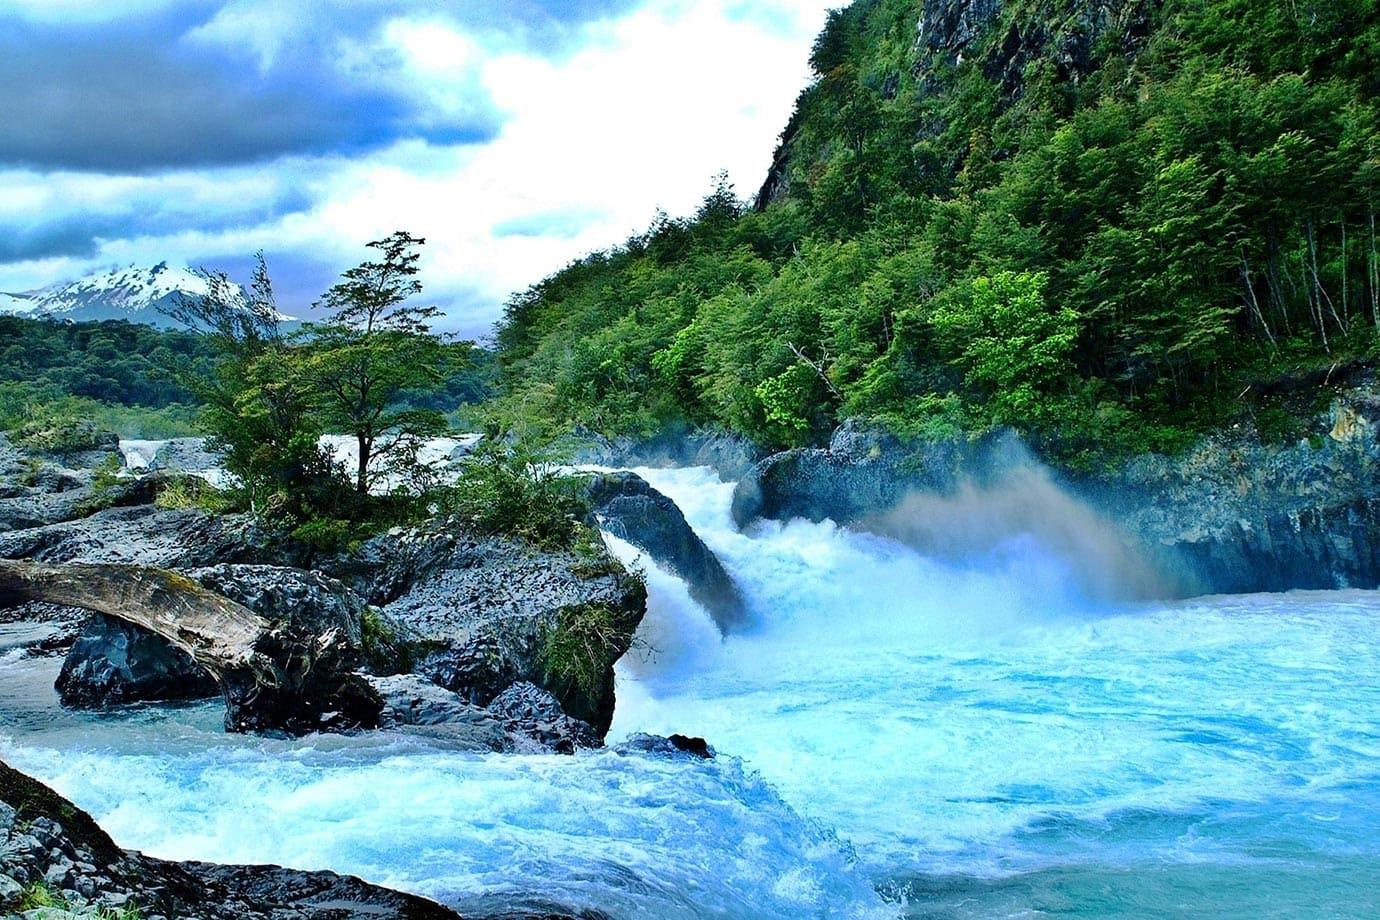 Petrohue River, Chile